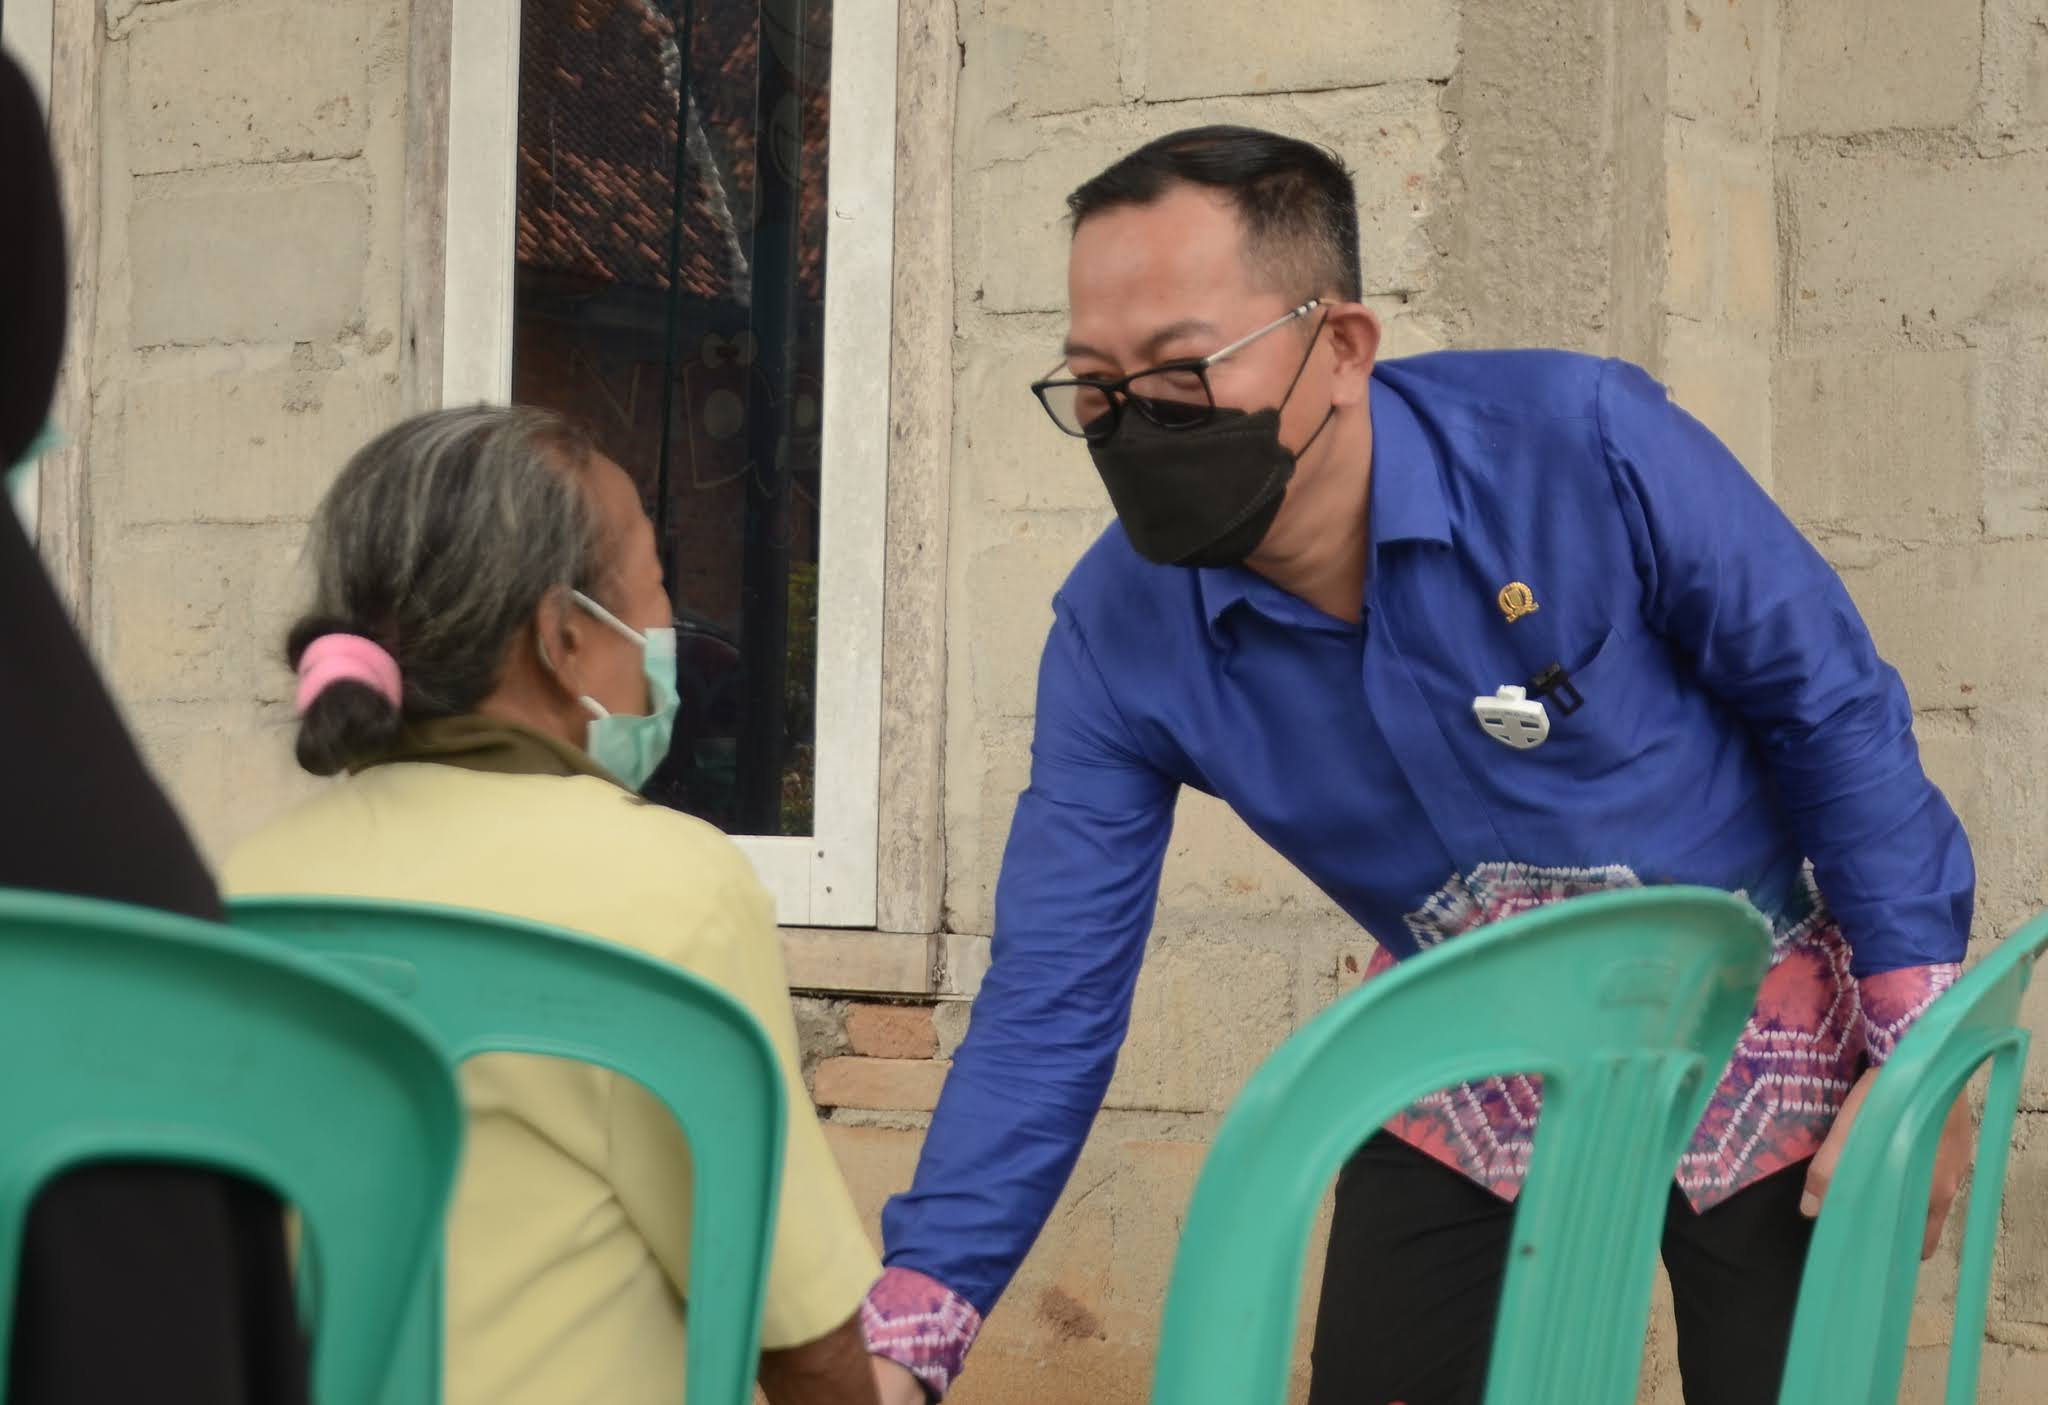 Reses ke Delapan Kecamatan, Deni Ribowo Dikeluhkan  Kelangkaan Pupuk & Harga Singkong